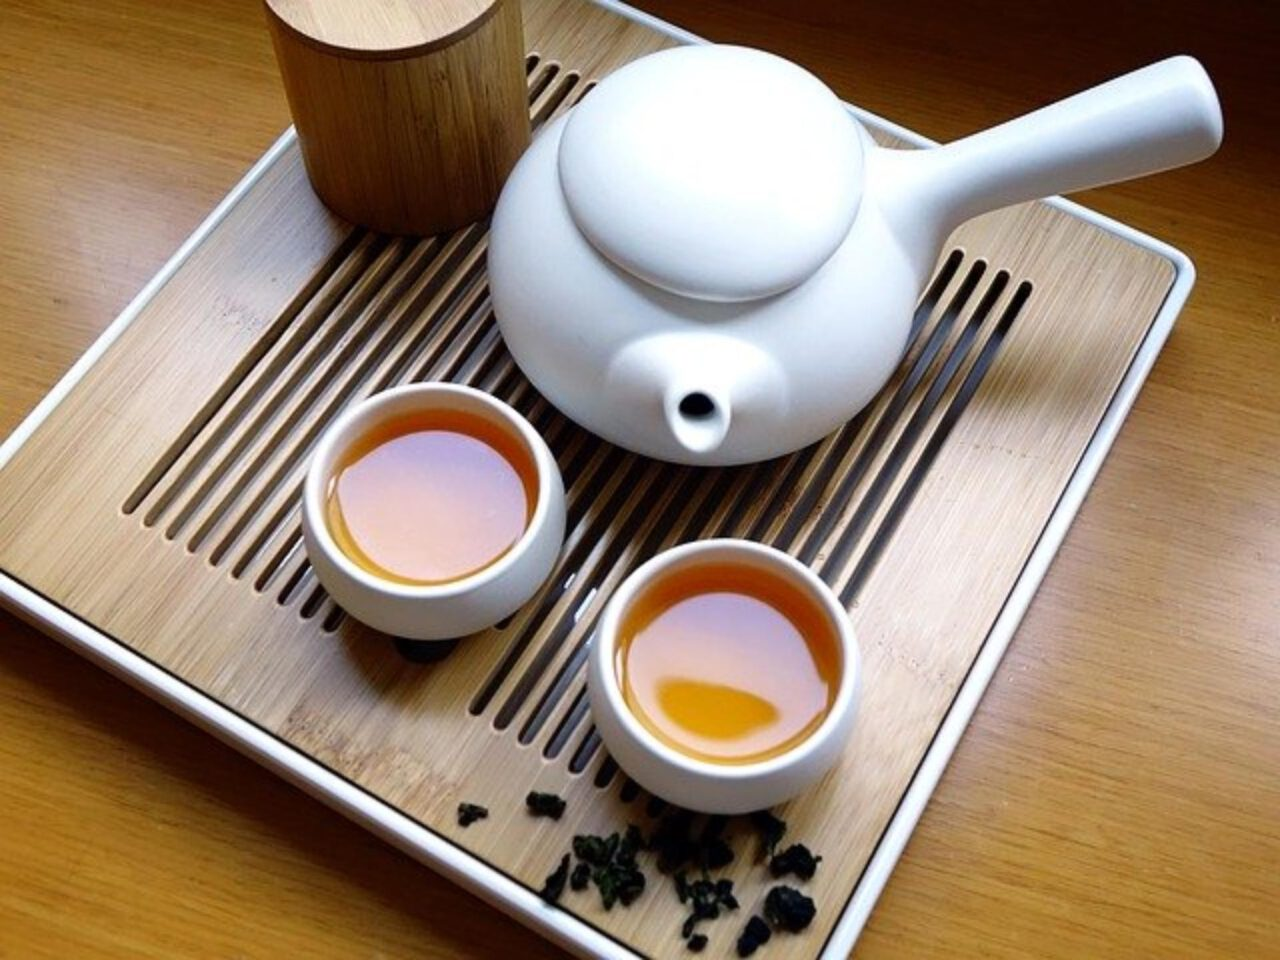 Picie herbaty na azjatycką modłę